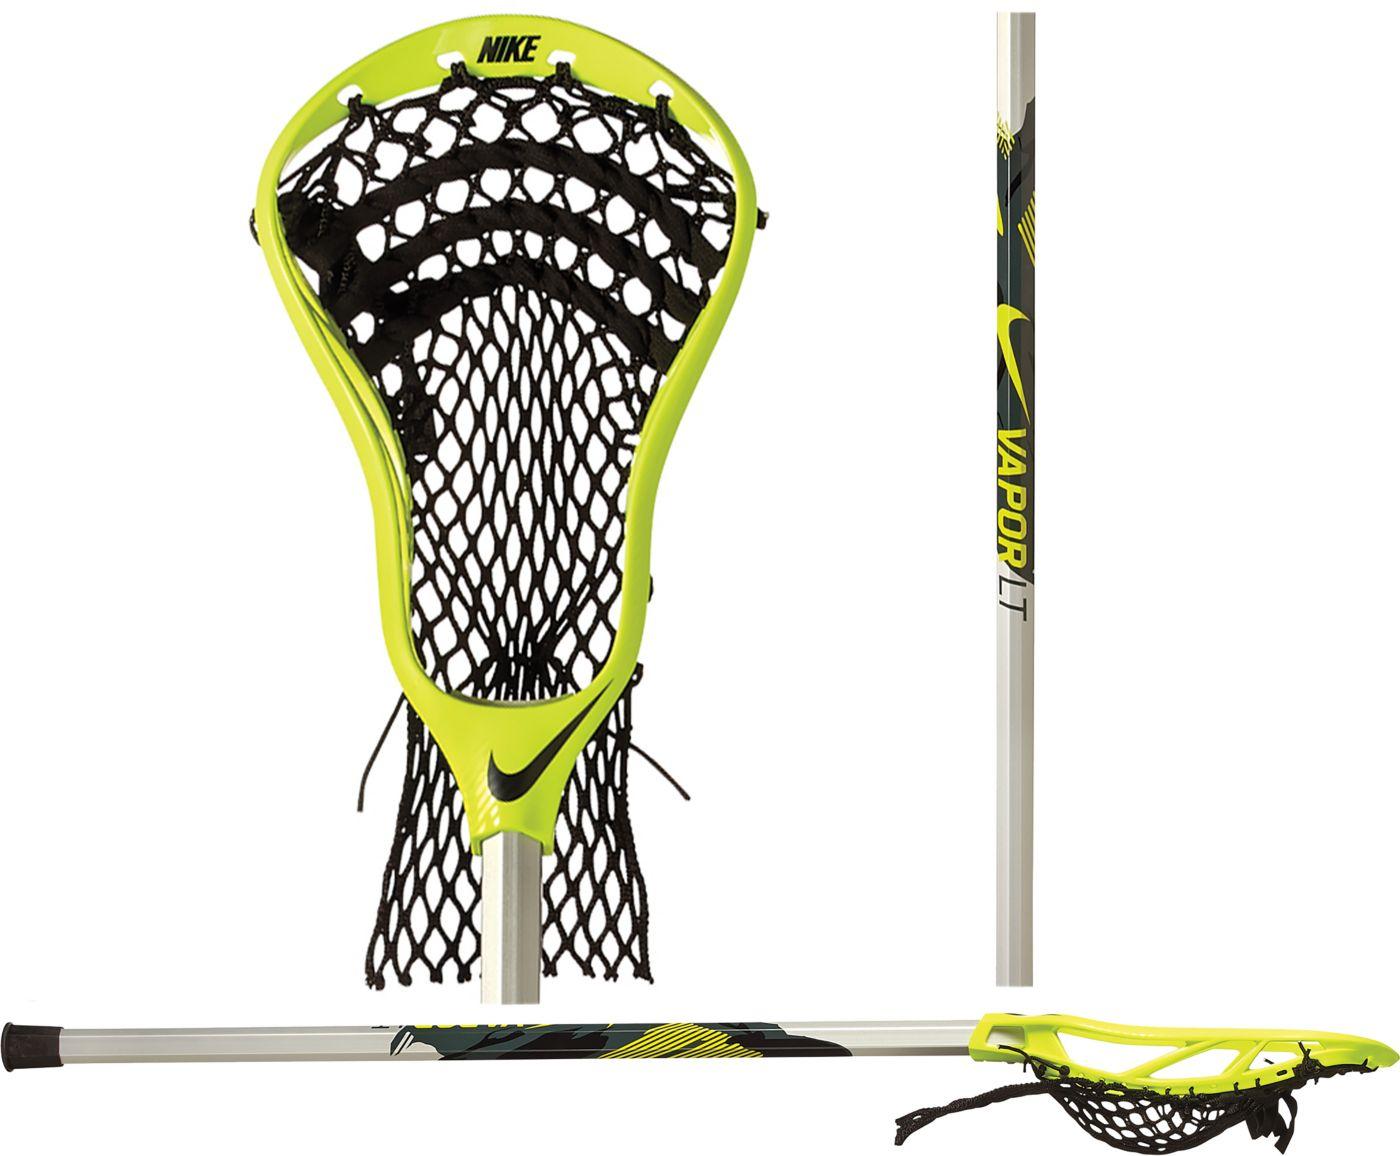 Nike Men's Vapor LT on Vapor 6000 Lacrosse Stick